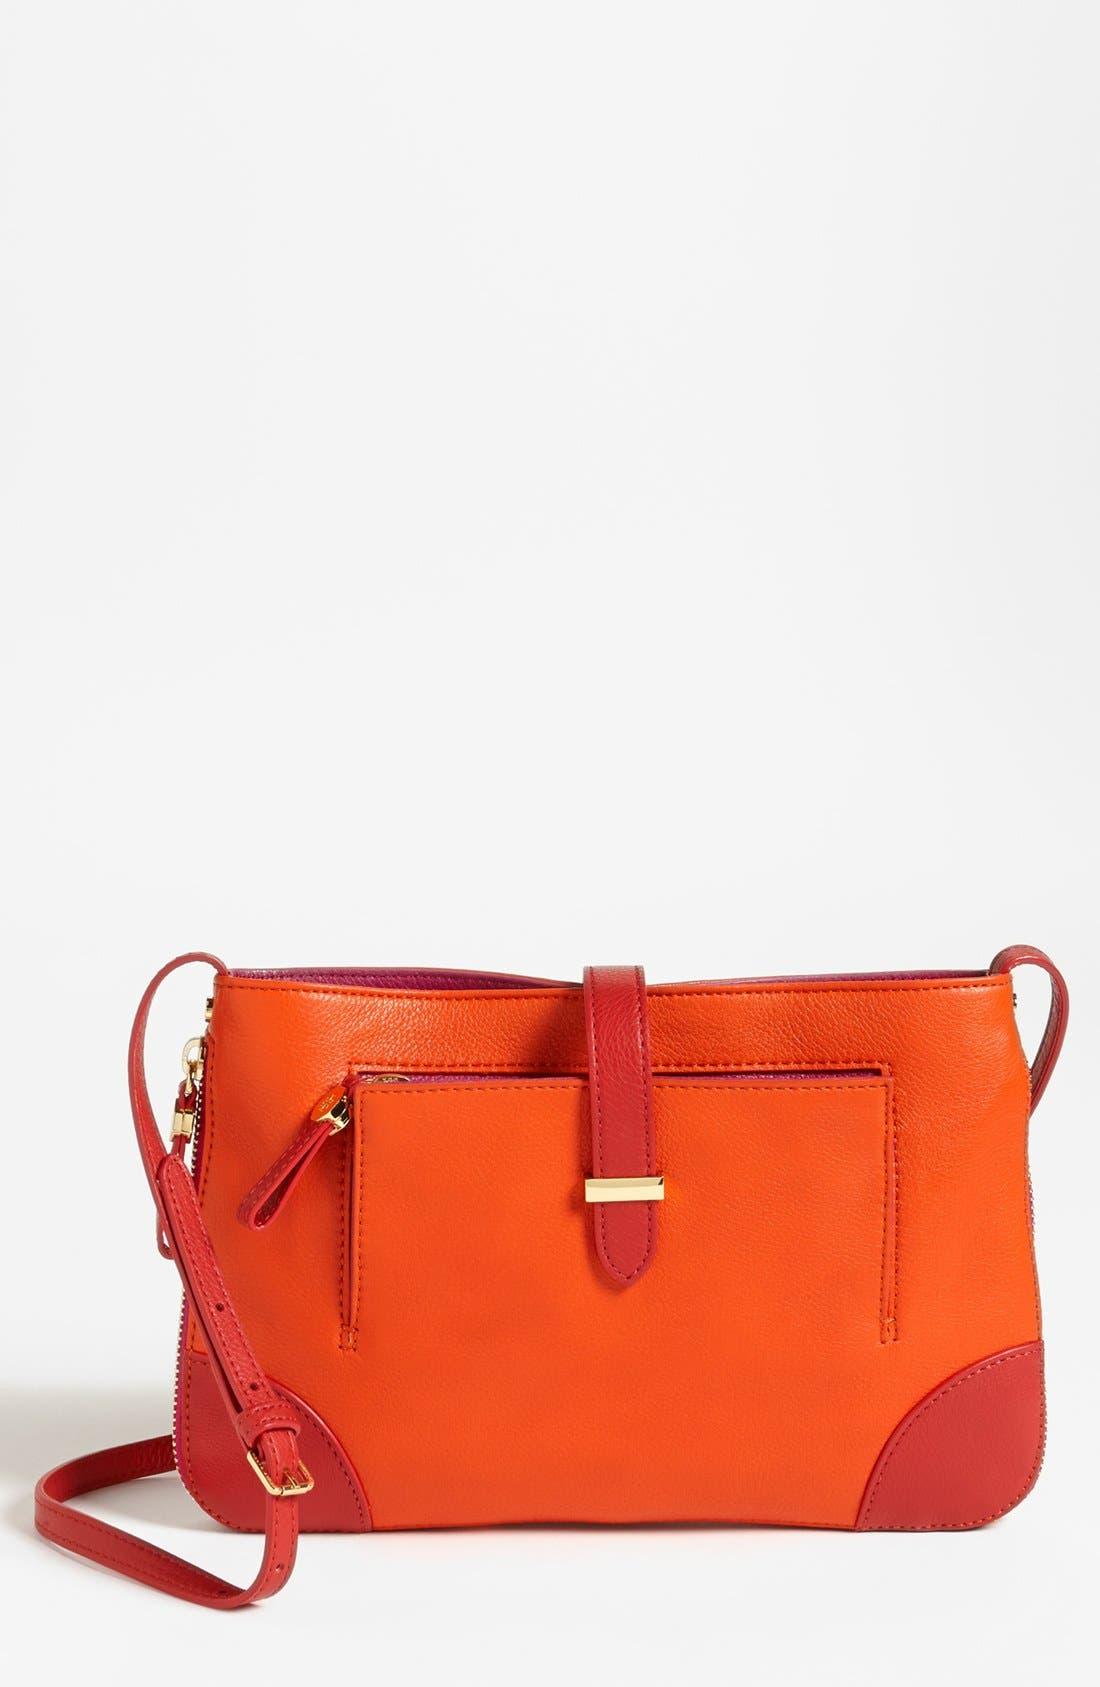 Main Image - Tory Burch 'Clay' Leather Crossbody Bag